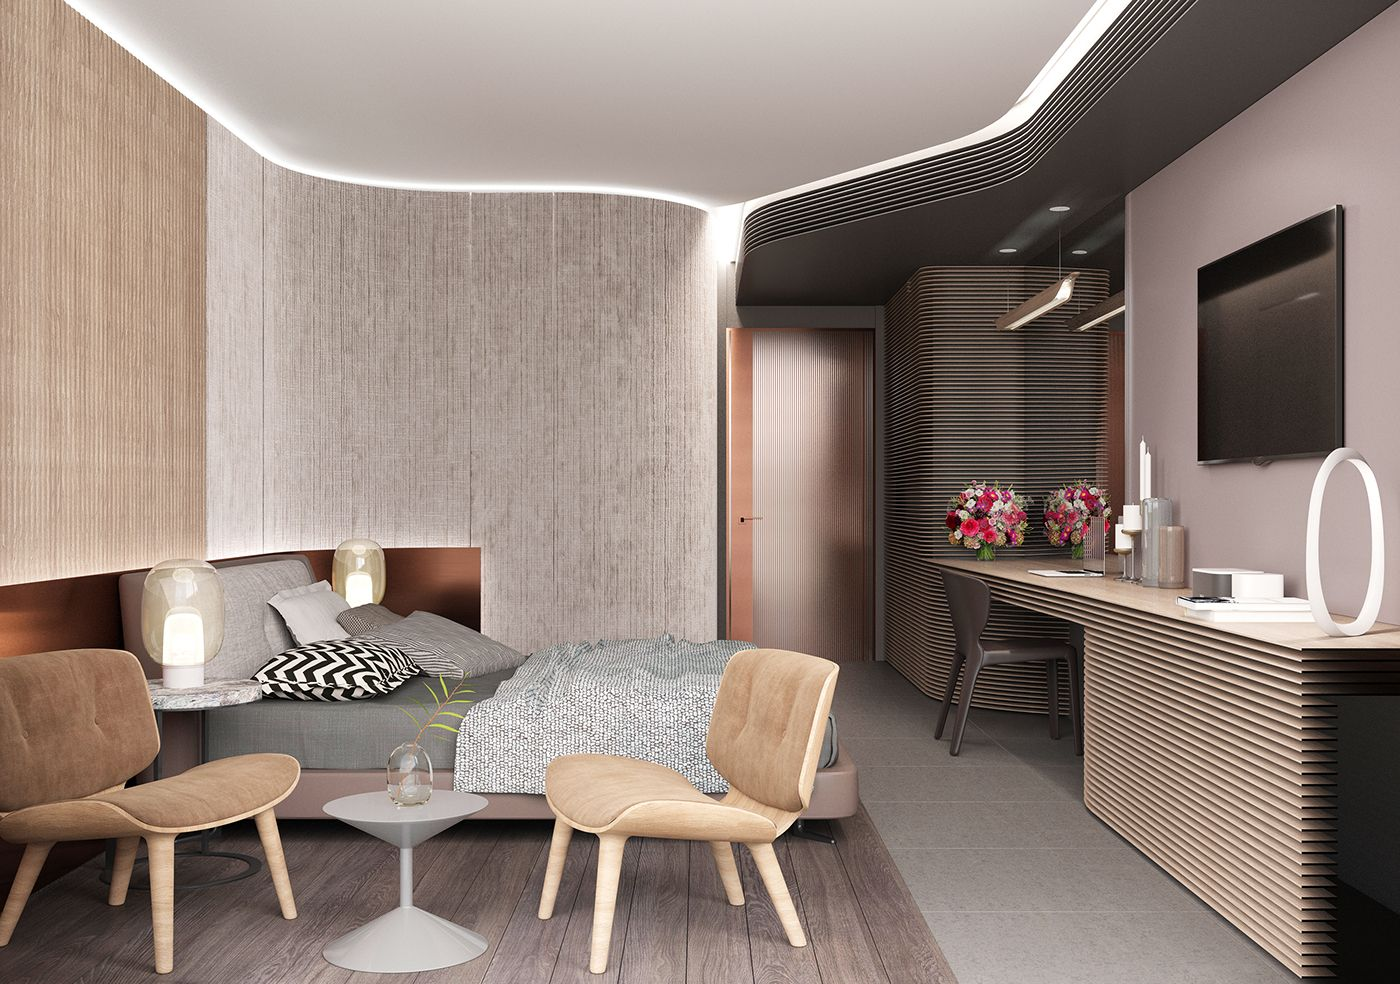 Best Hotel Room Corona Render On Behance Can H* Green 640 x 480